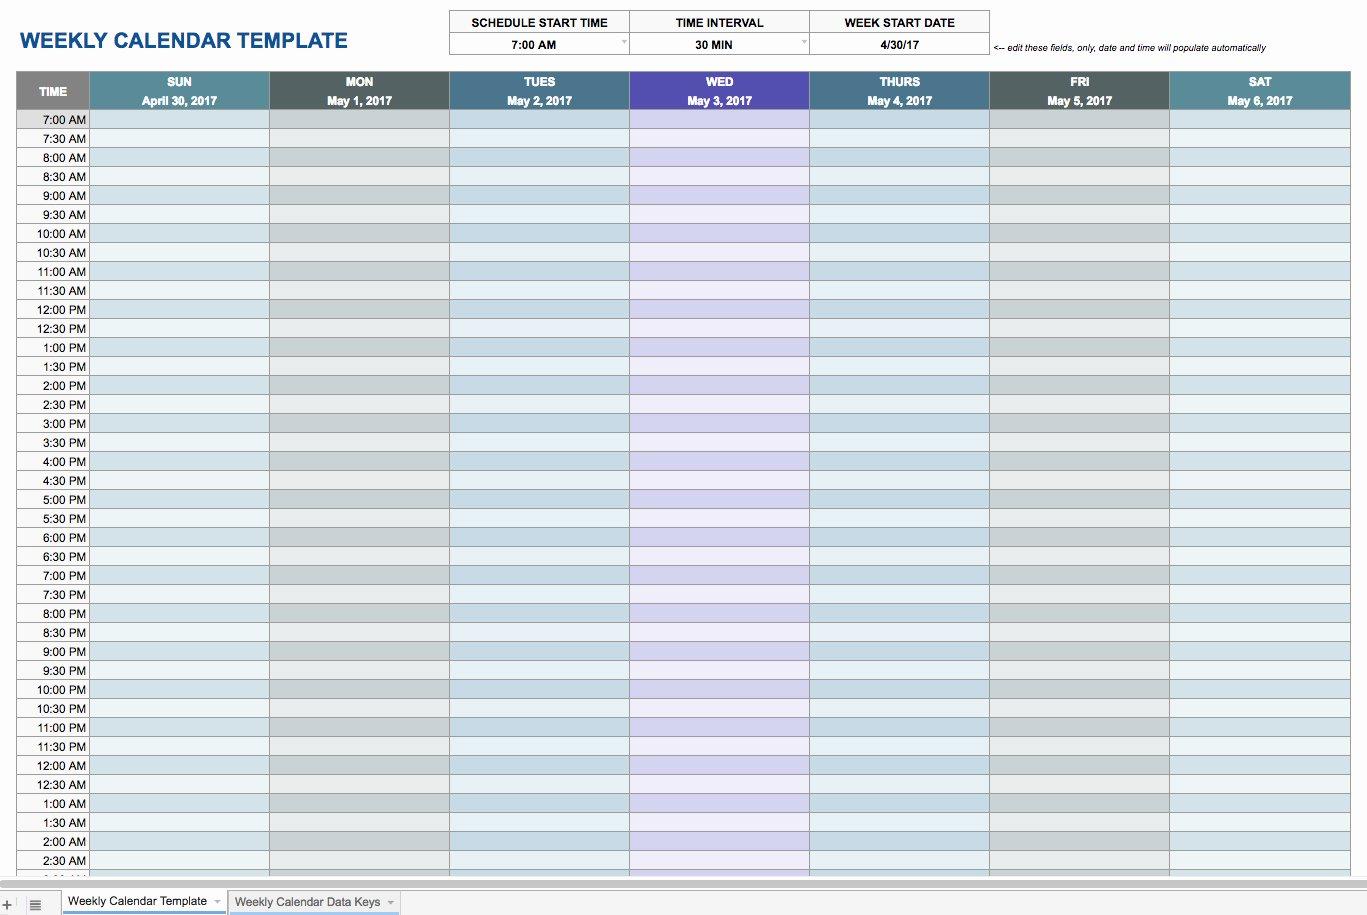 Google Sheets Receipt Template New Weekly Schedule Template Google Docs